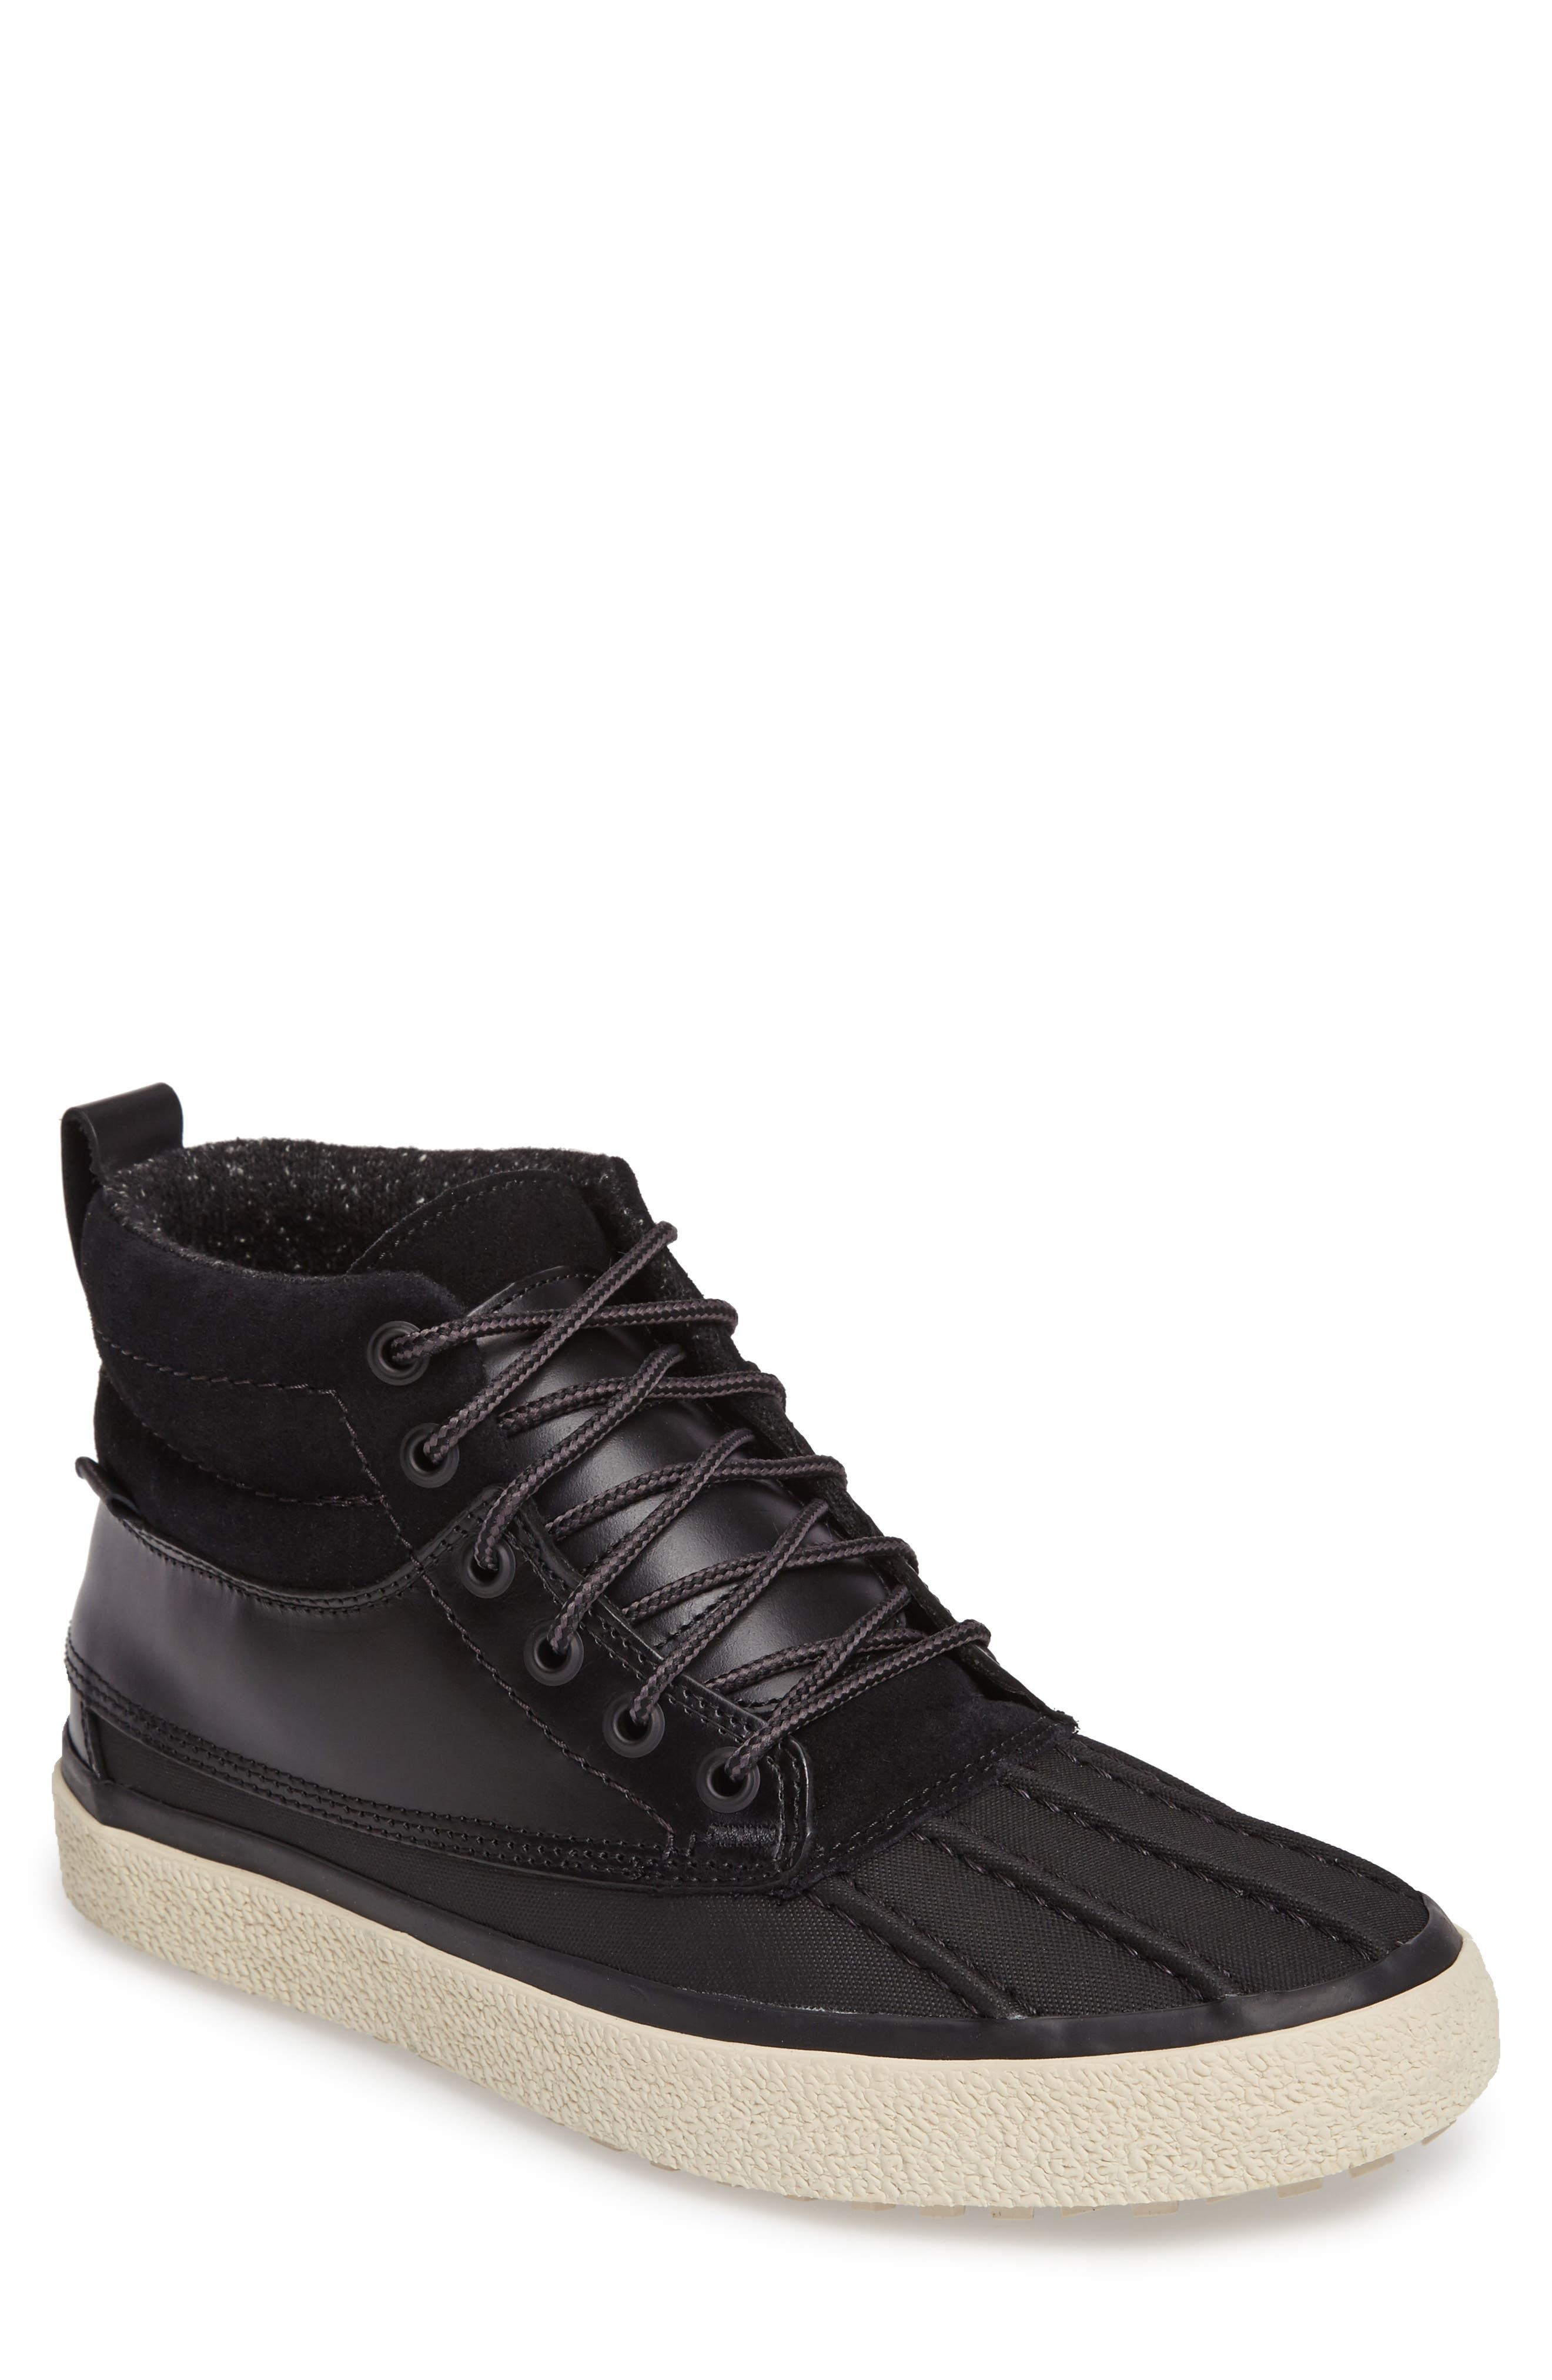 VANS SK8-Hi Del Pato MTE Water Repellent Sneaker